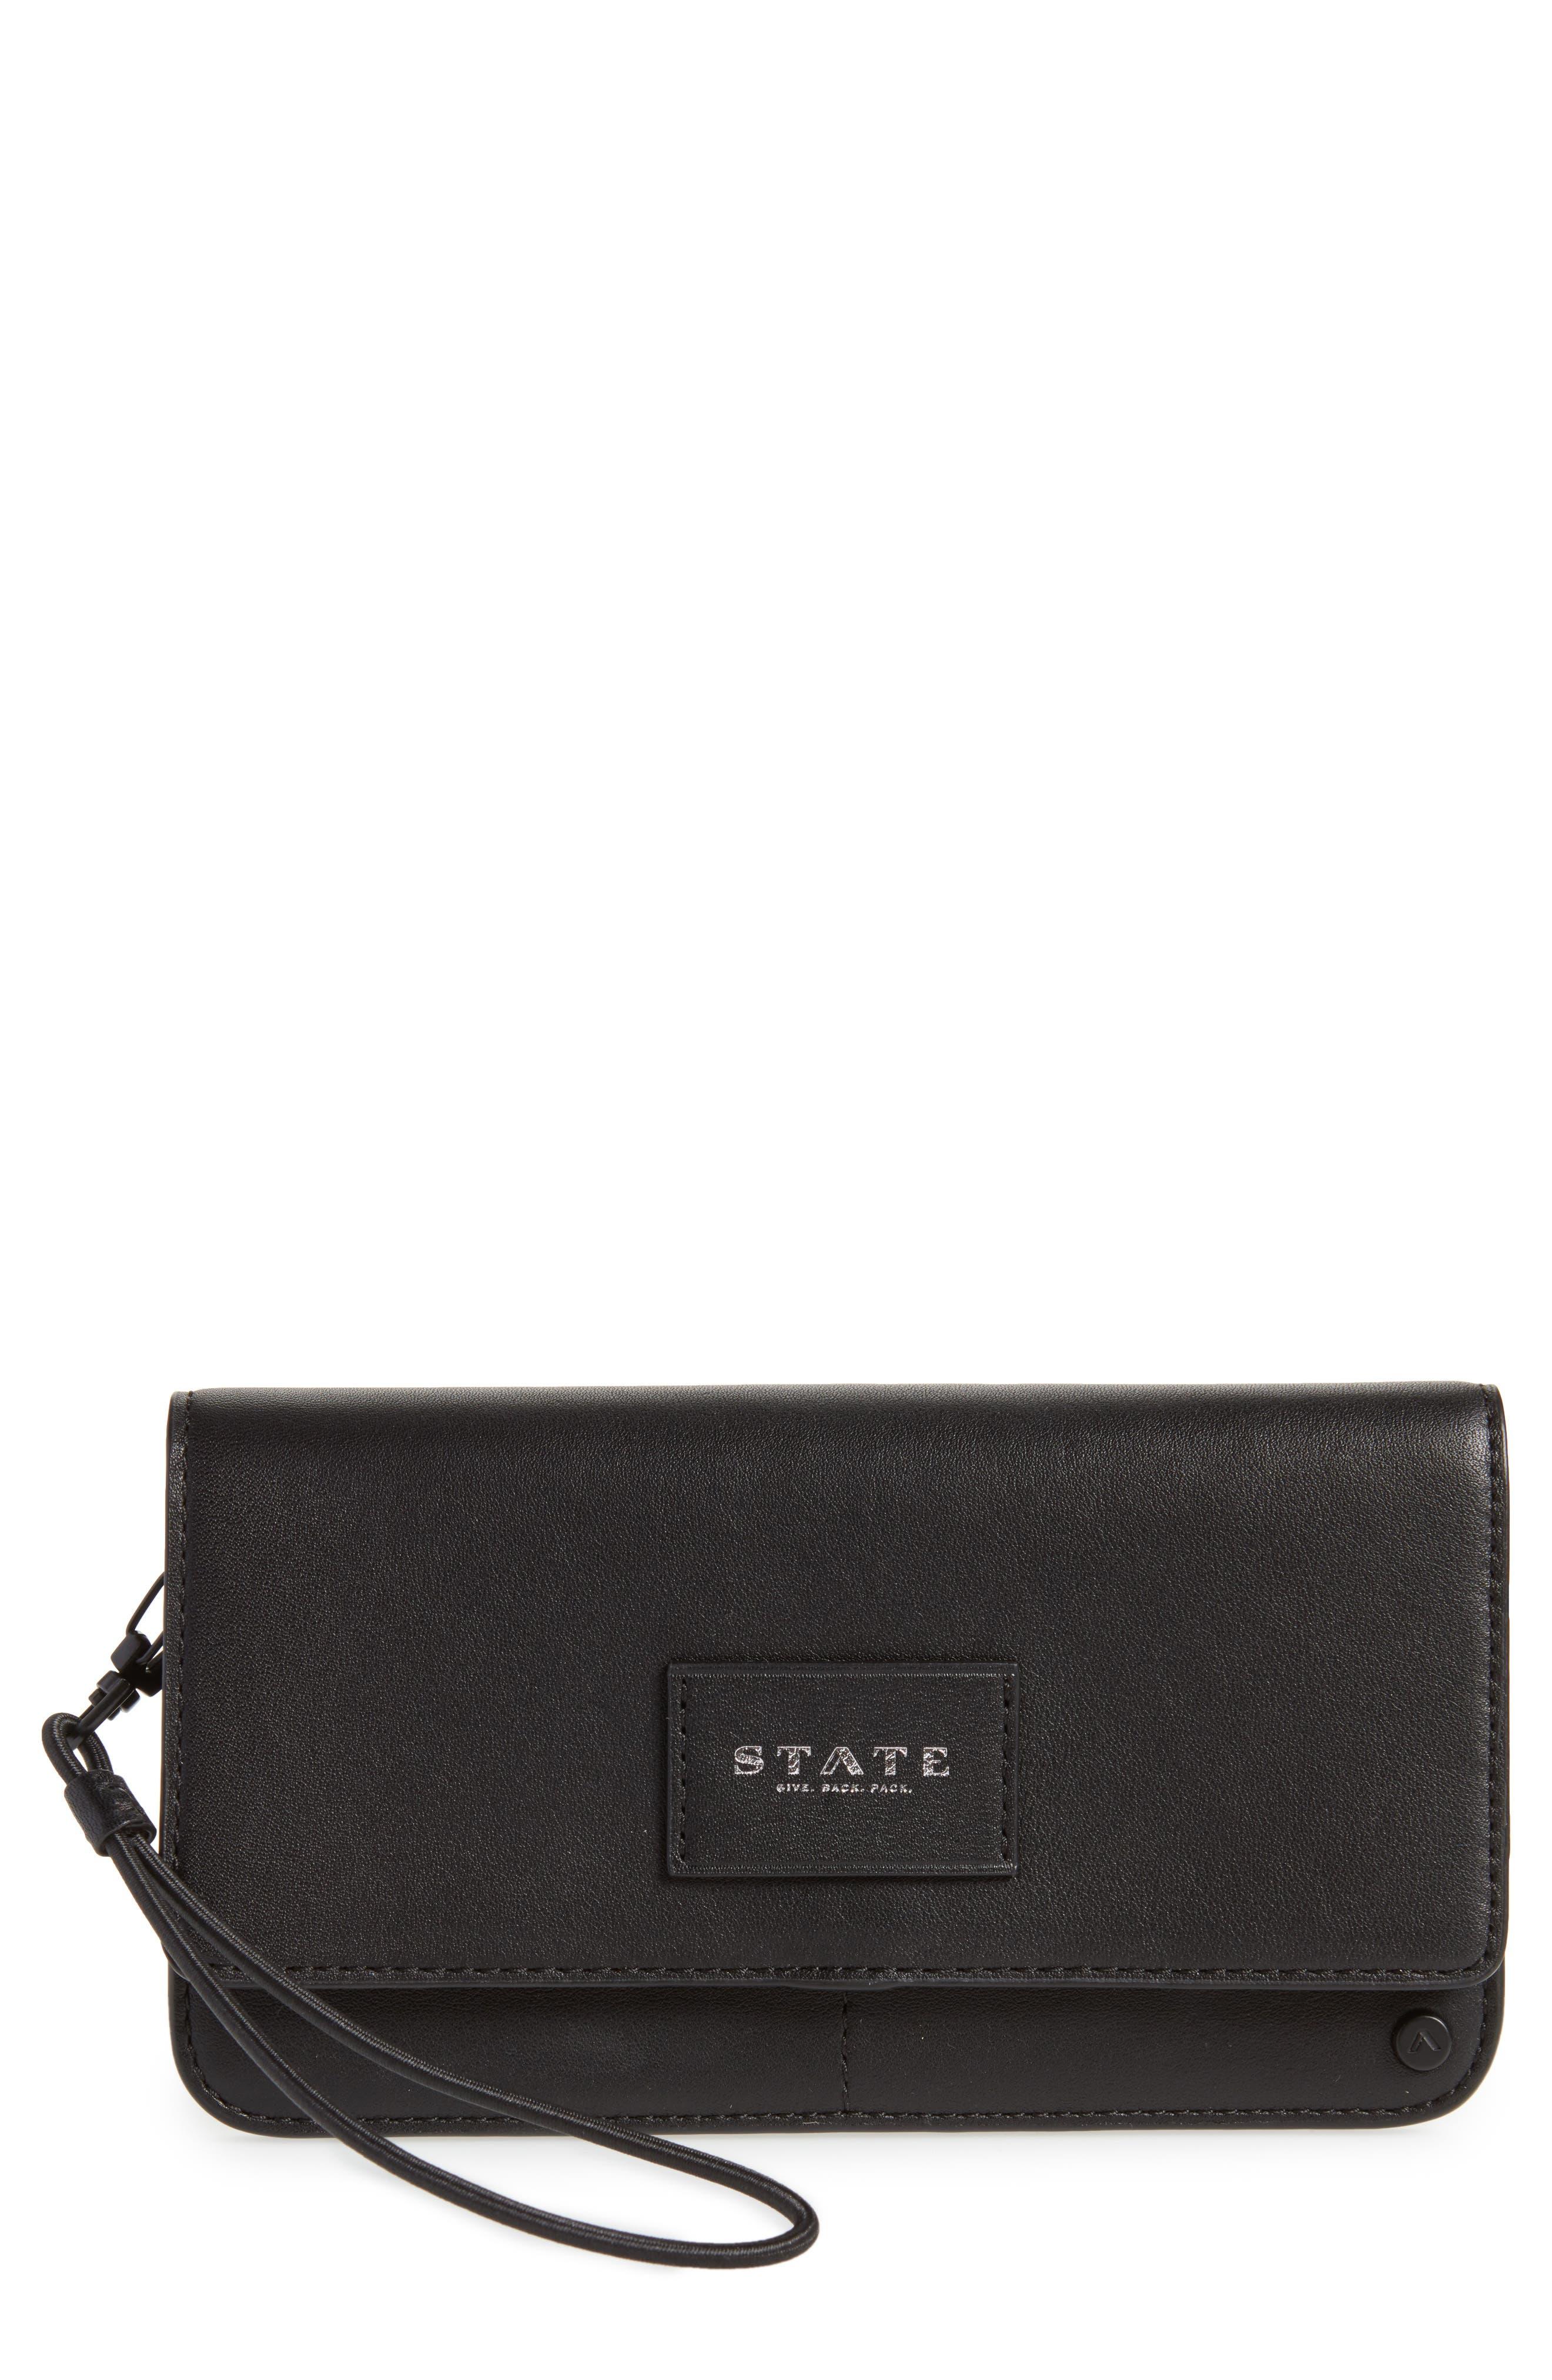 Parkville Bristol Leather Wristlet,                         Main,                         color, Black